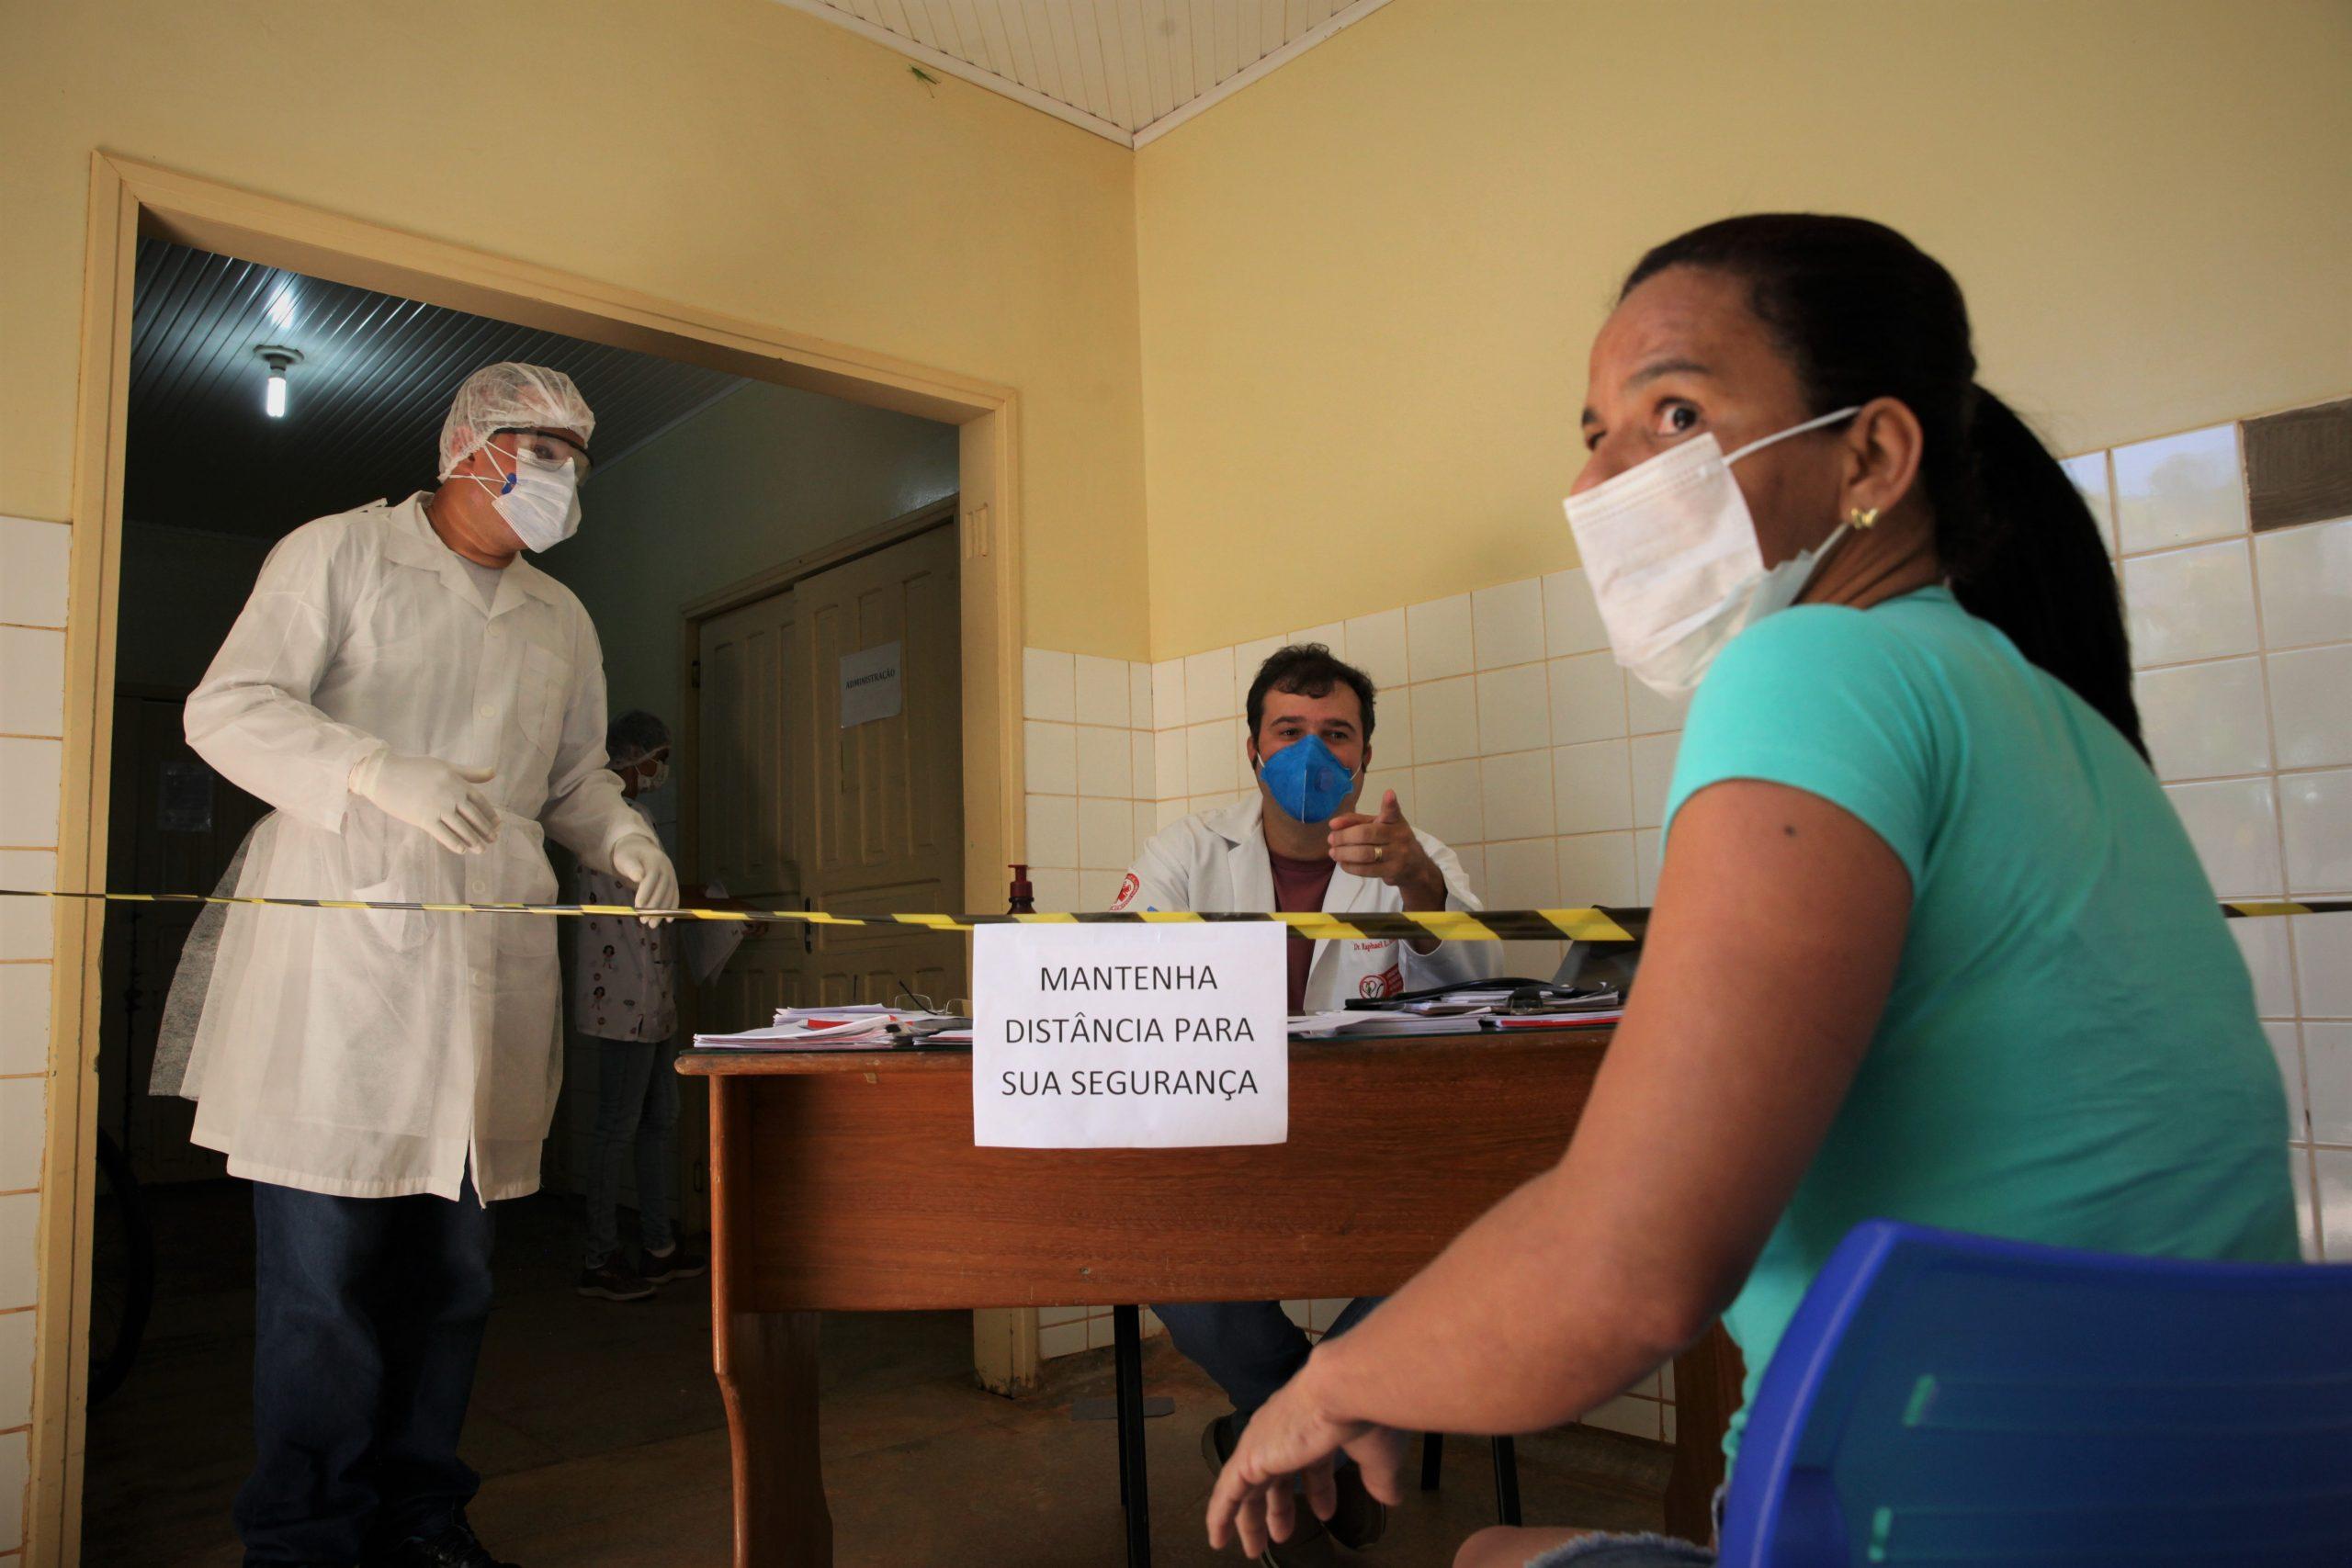 Saúde disponibiliza ambulância com UTI e novos enfermeiros para Acrelândia